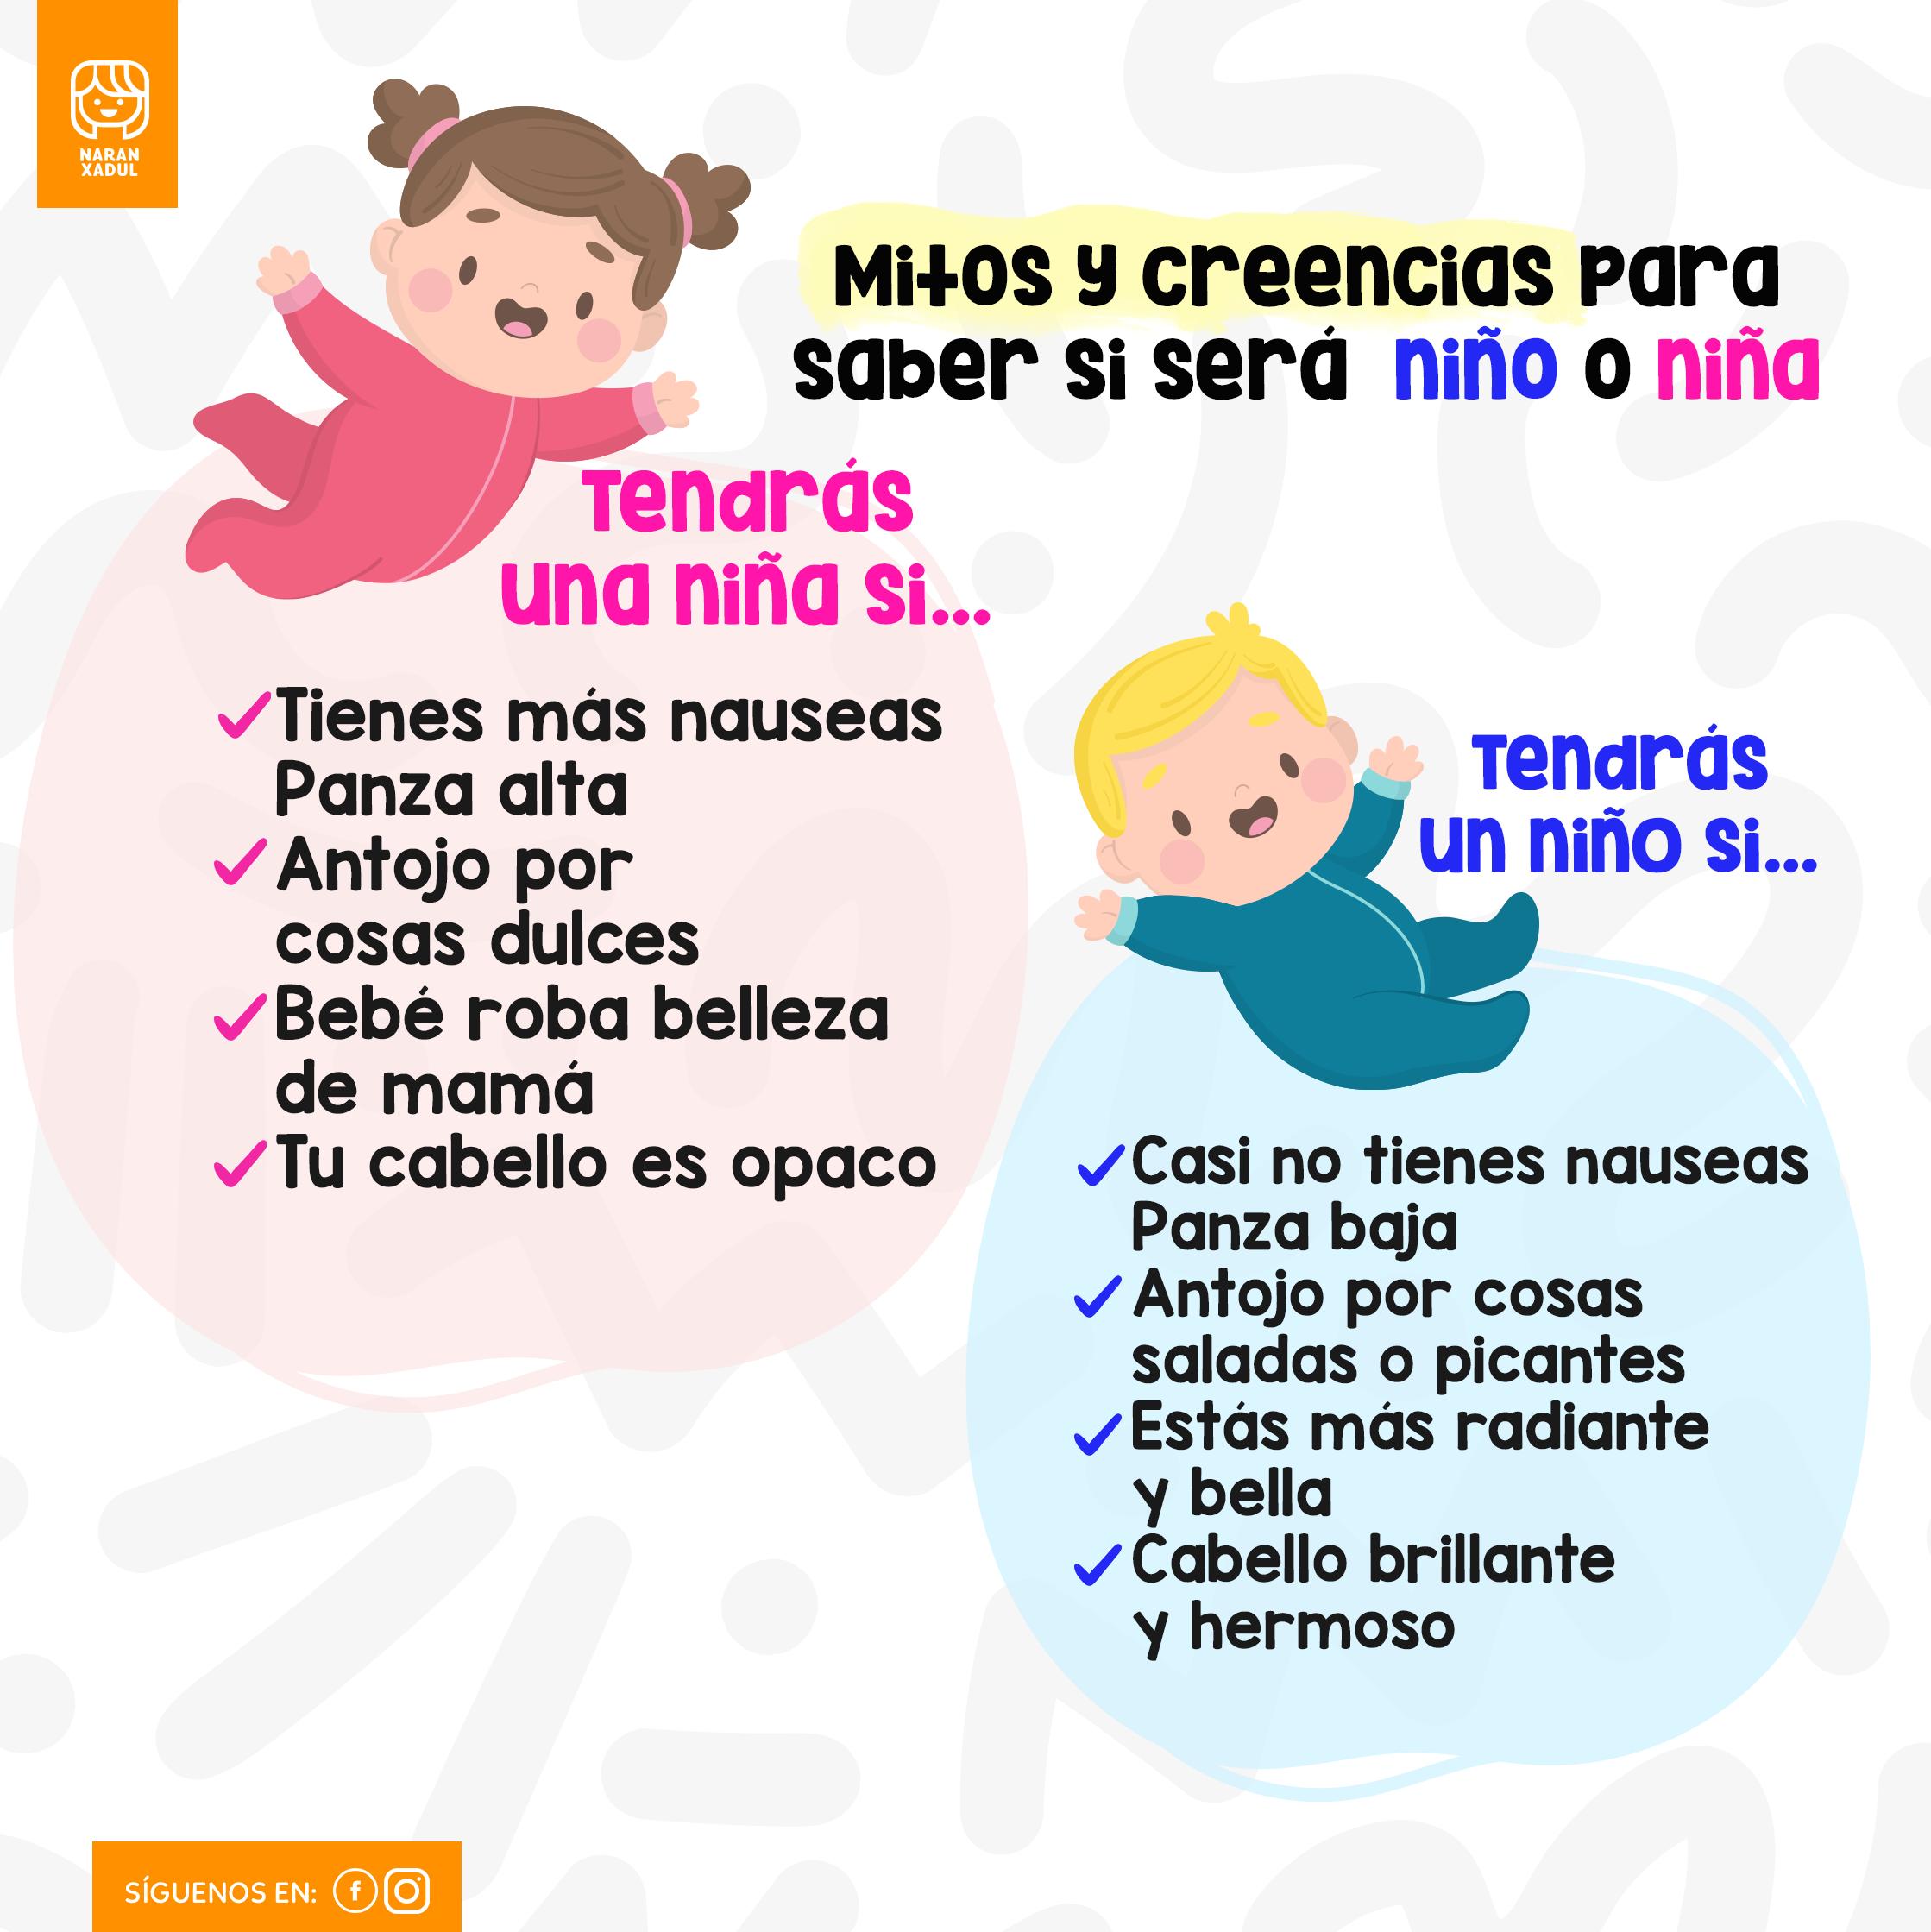 Mitos Y Creencias Para Saber Si Será Niño O Niña Vida De Mamá Nauseas Niños